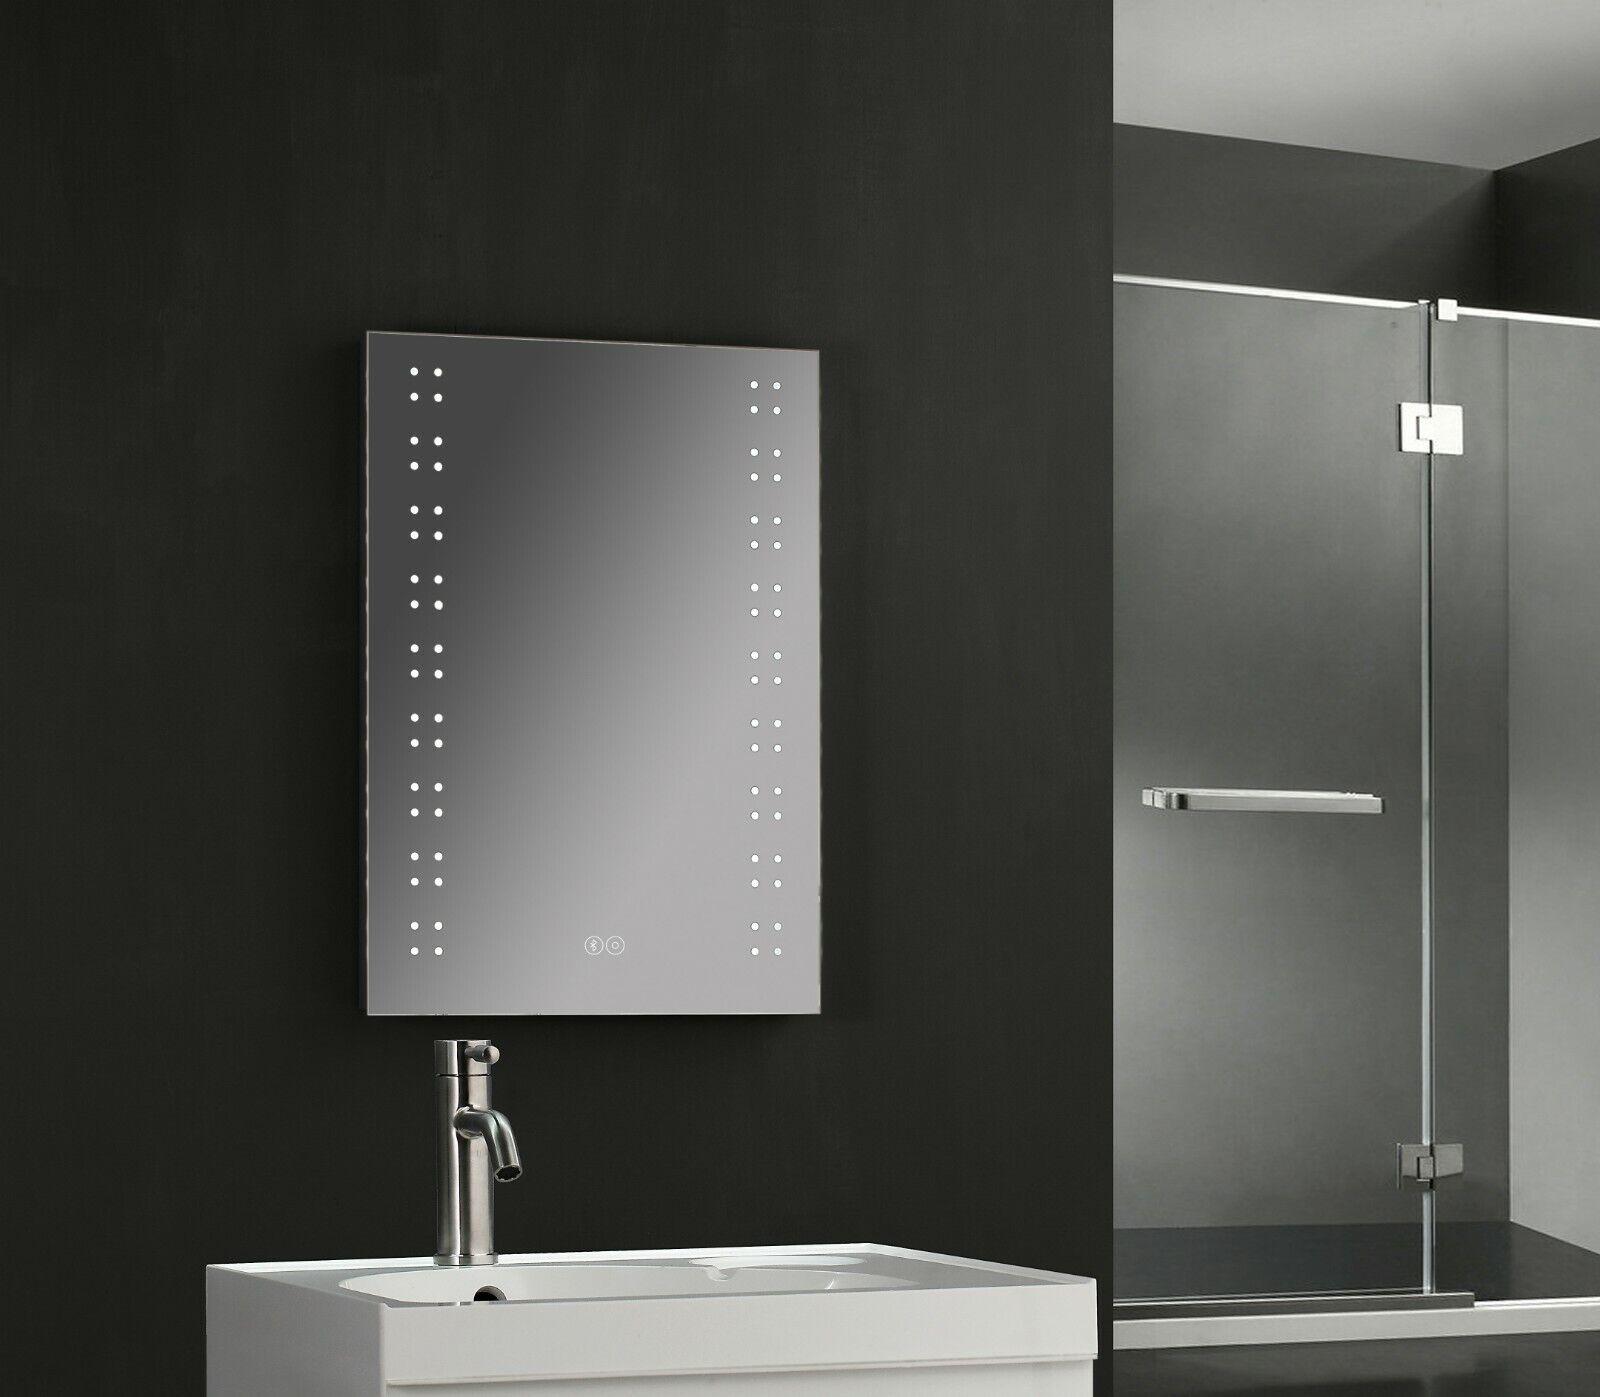 700 x 500mm Illuminated Bathroom LED Mirror , Demist & Shaver